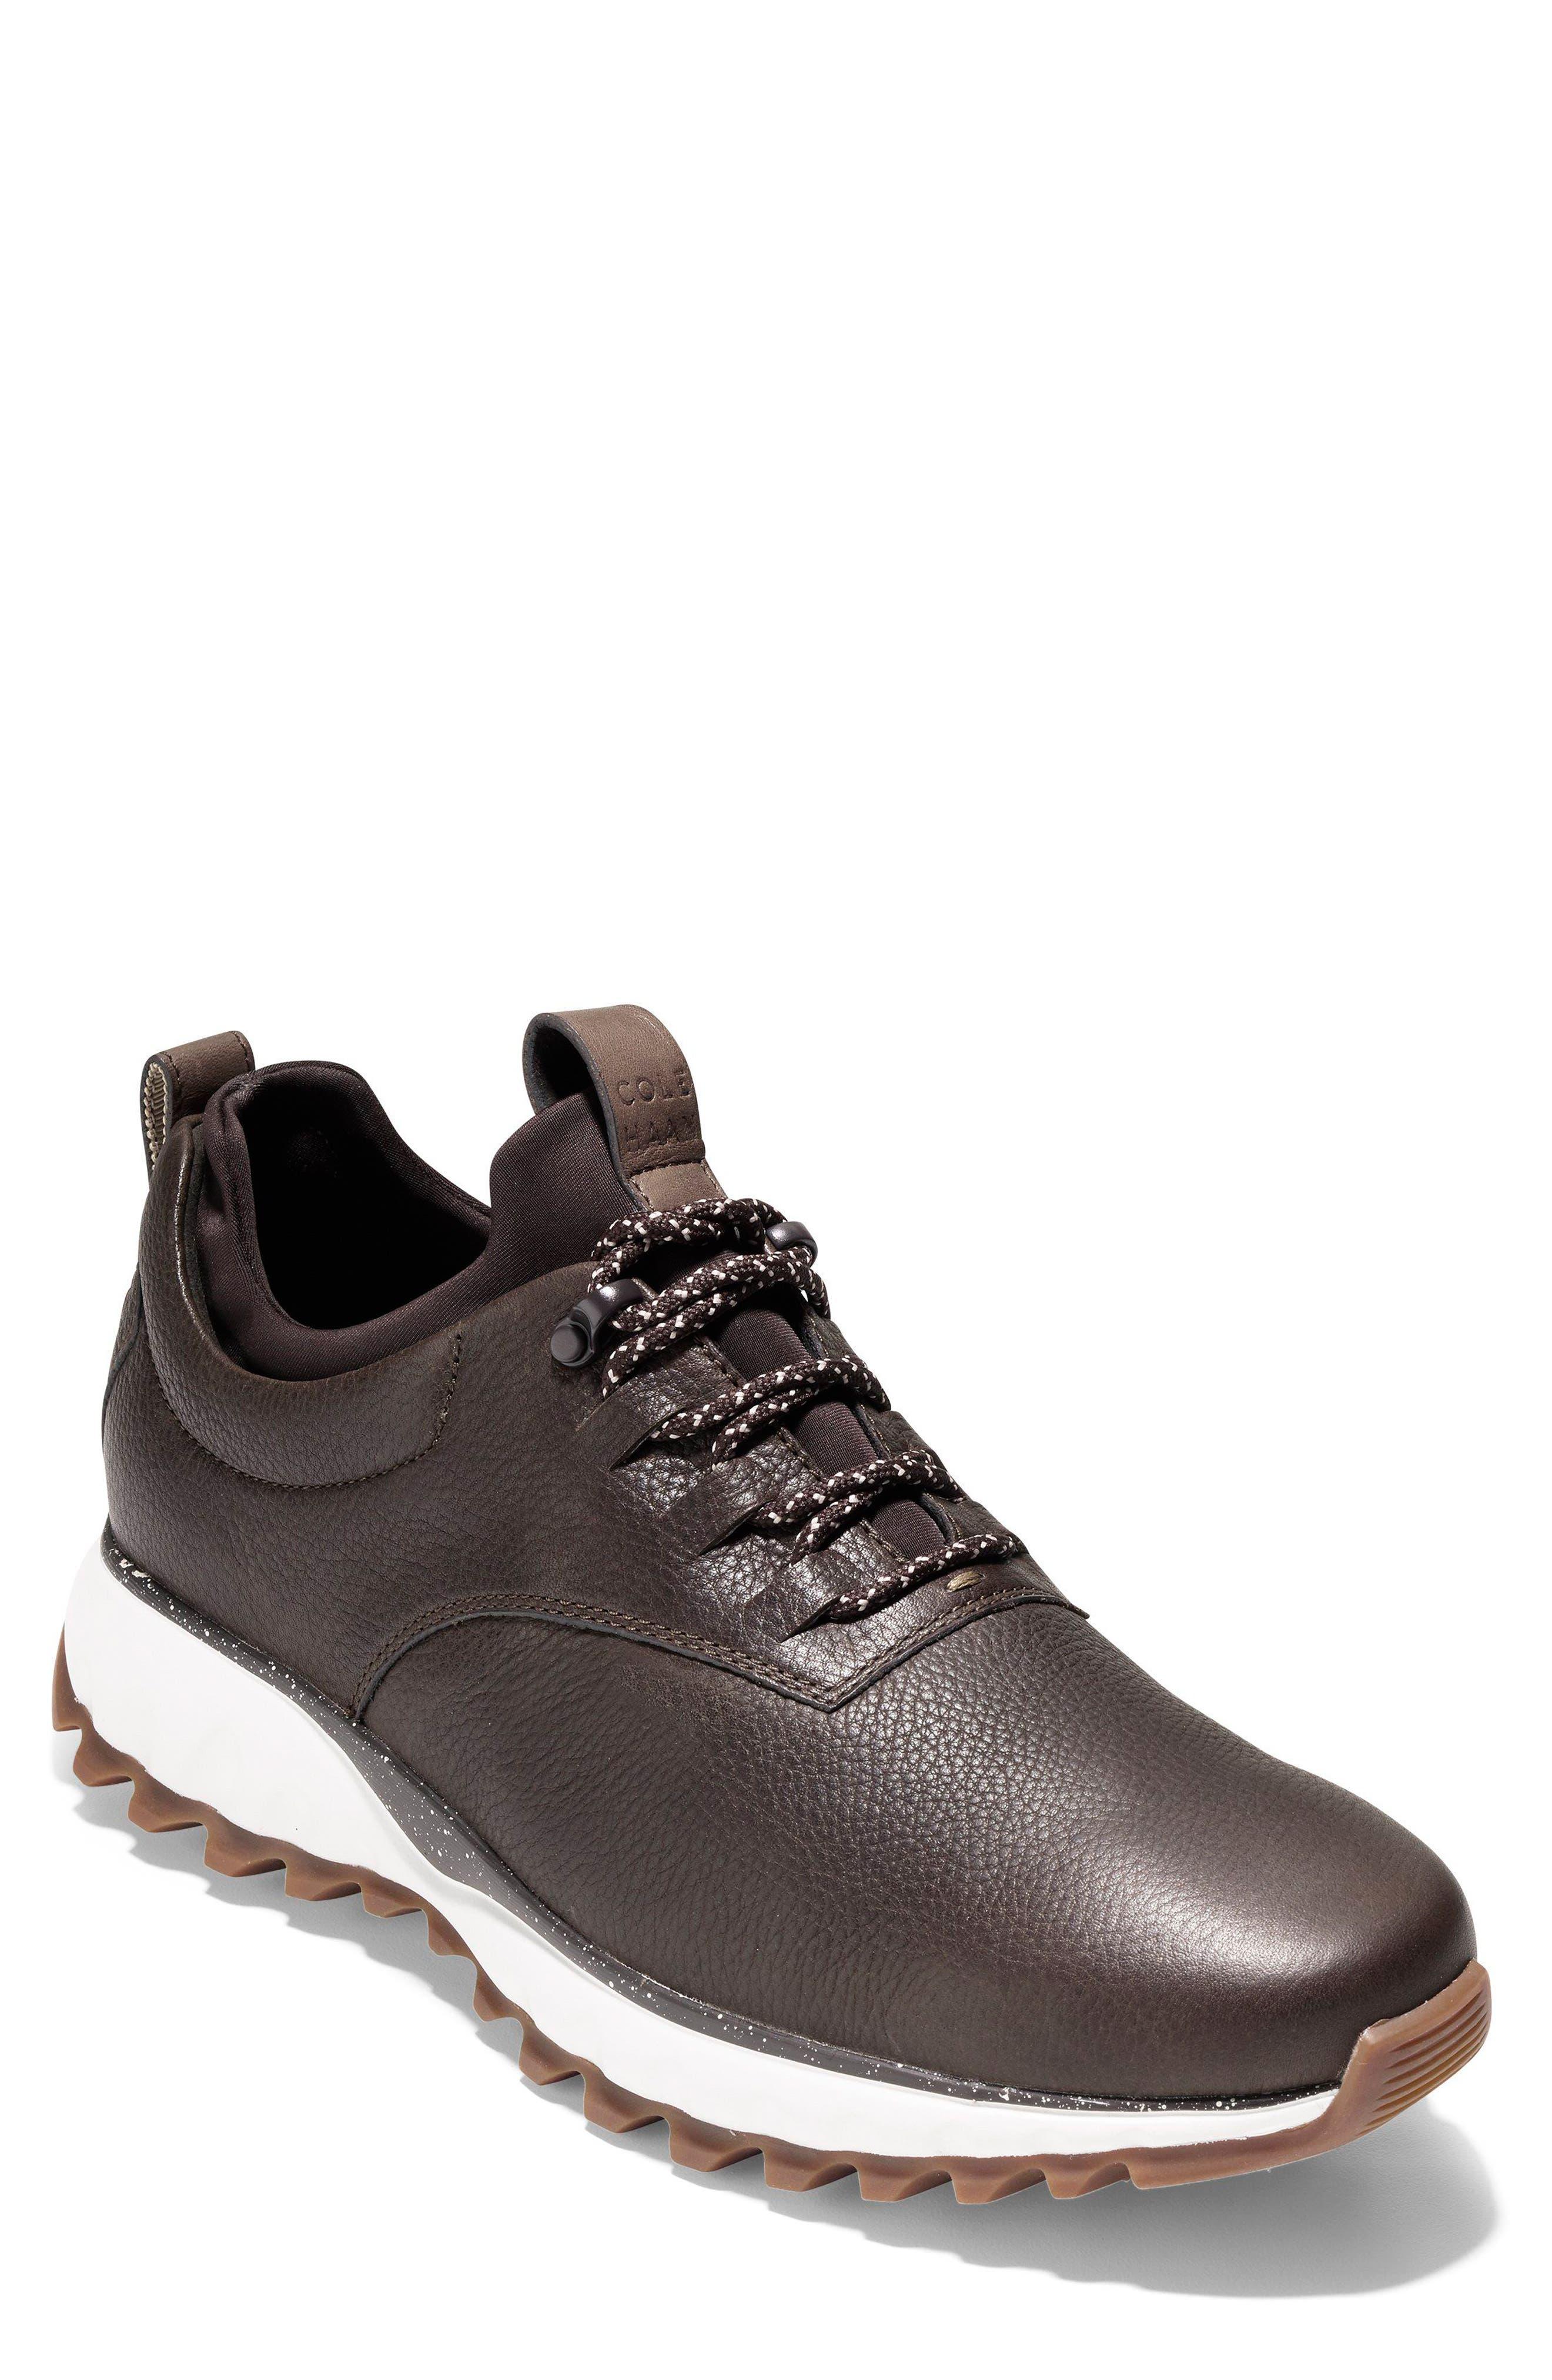 GrandExpløre All Terrain Waterproof Sneaker,                         Main,                         color, 200